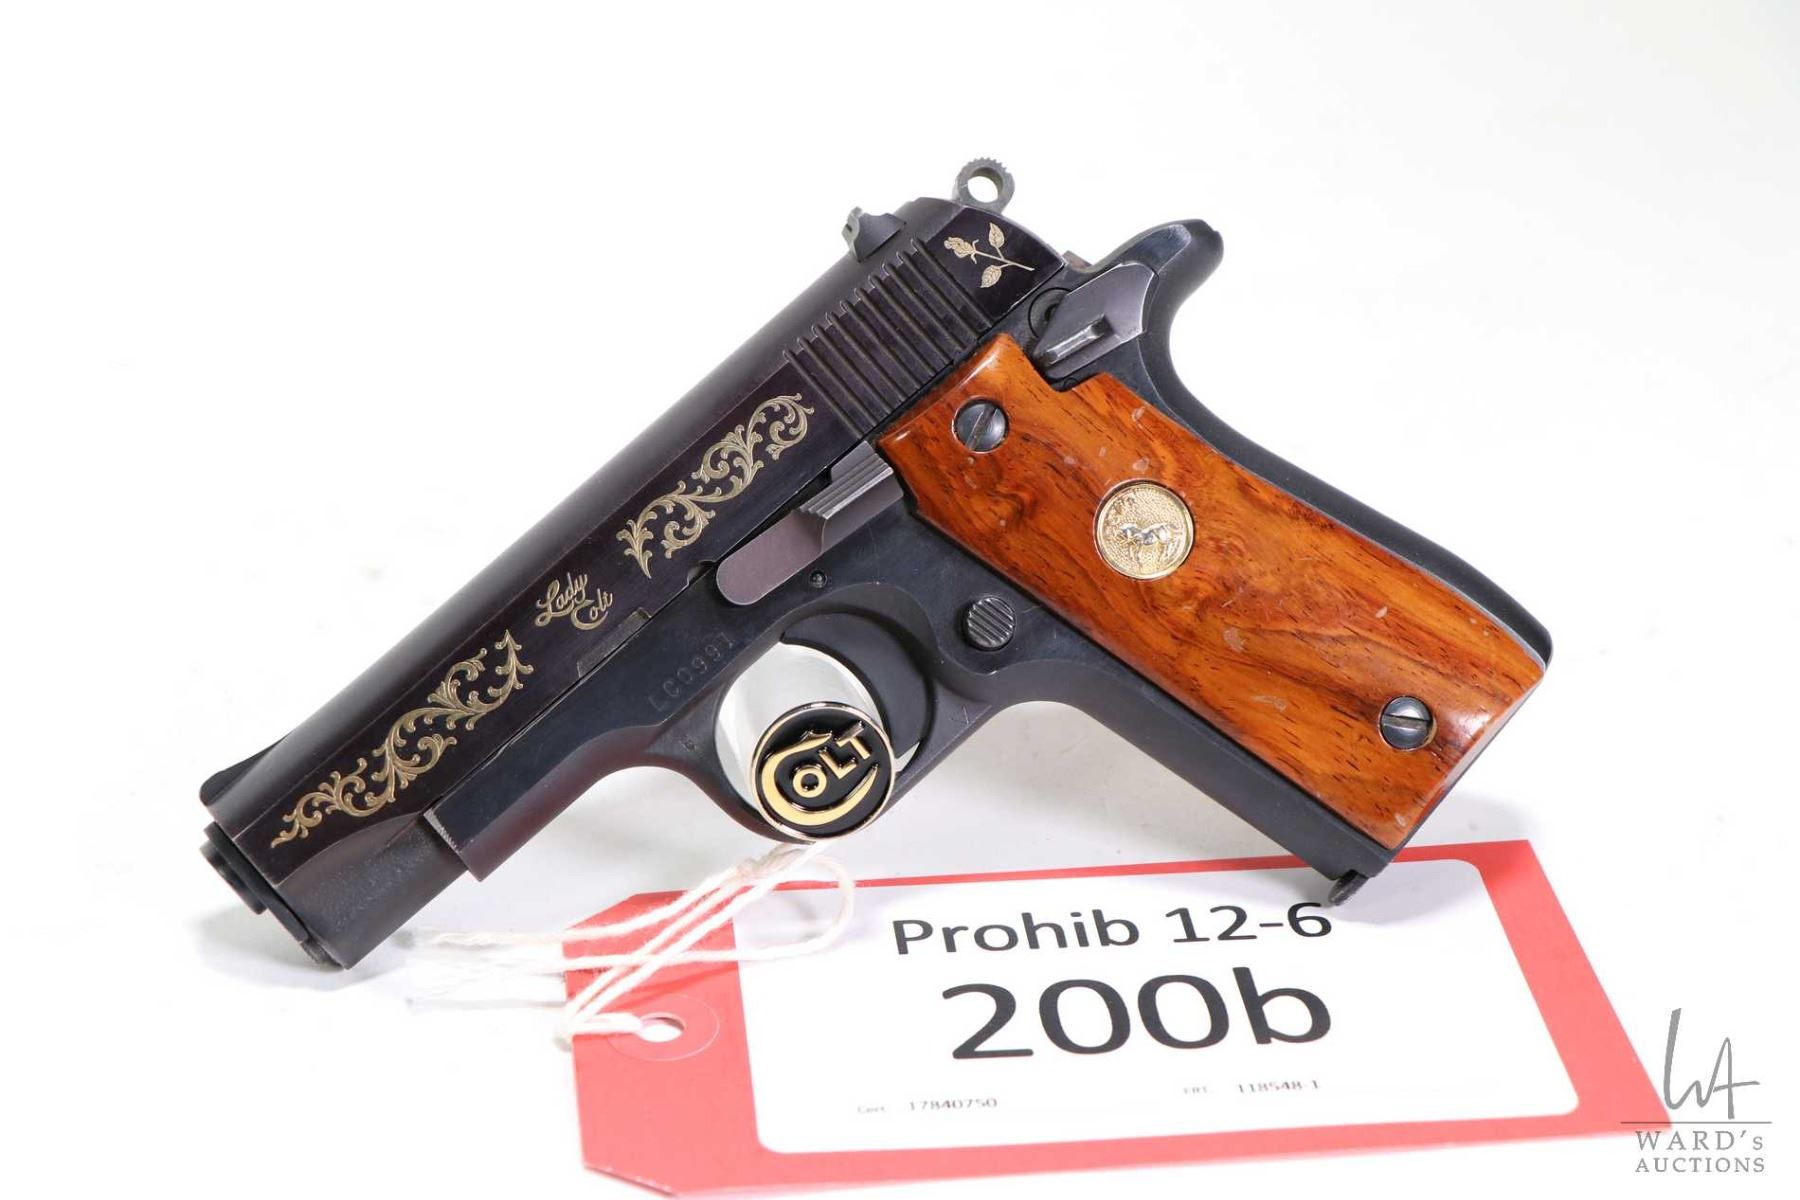 https://www.icollector.com/Prohib-12-6-handgun-Colt-model-Gov-t-Series-80-Lady-Colt-380-auto-seven-shot-semi-automatic-w-bb_i37625194